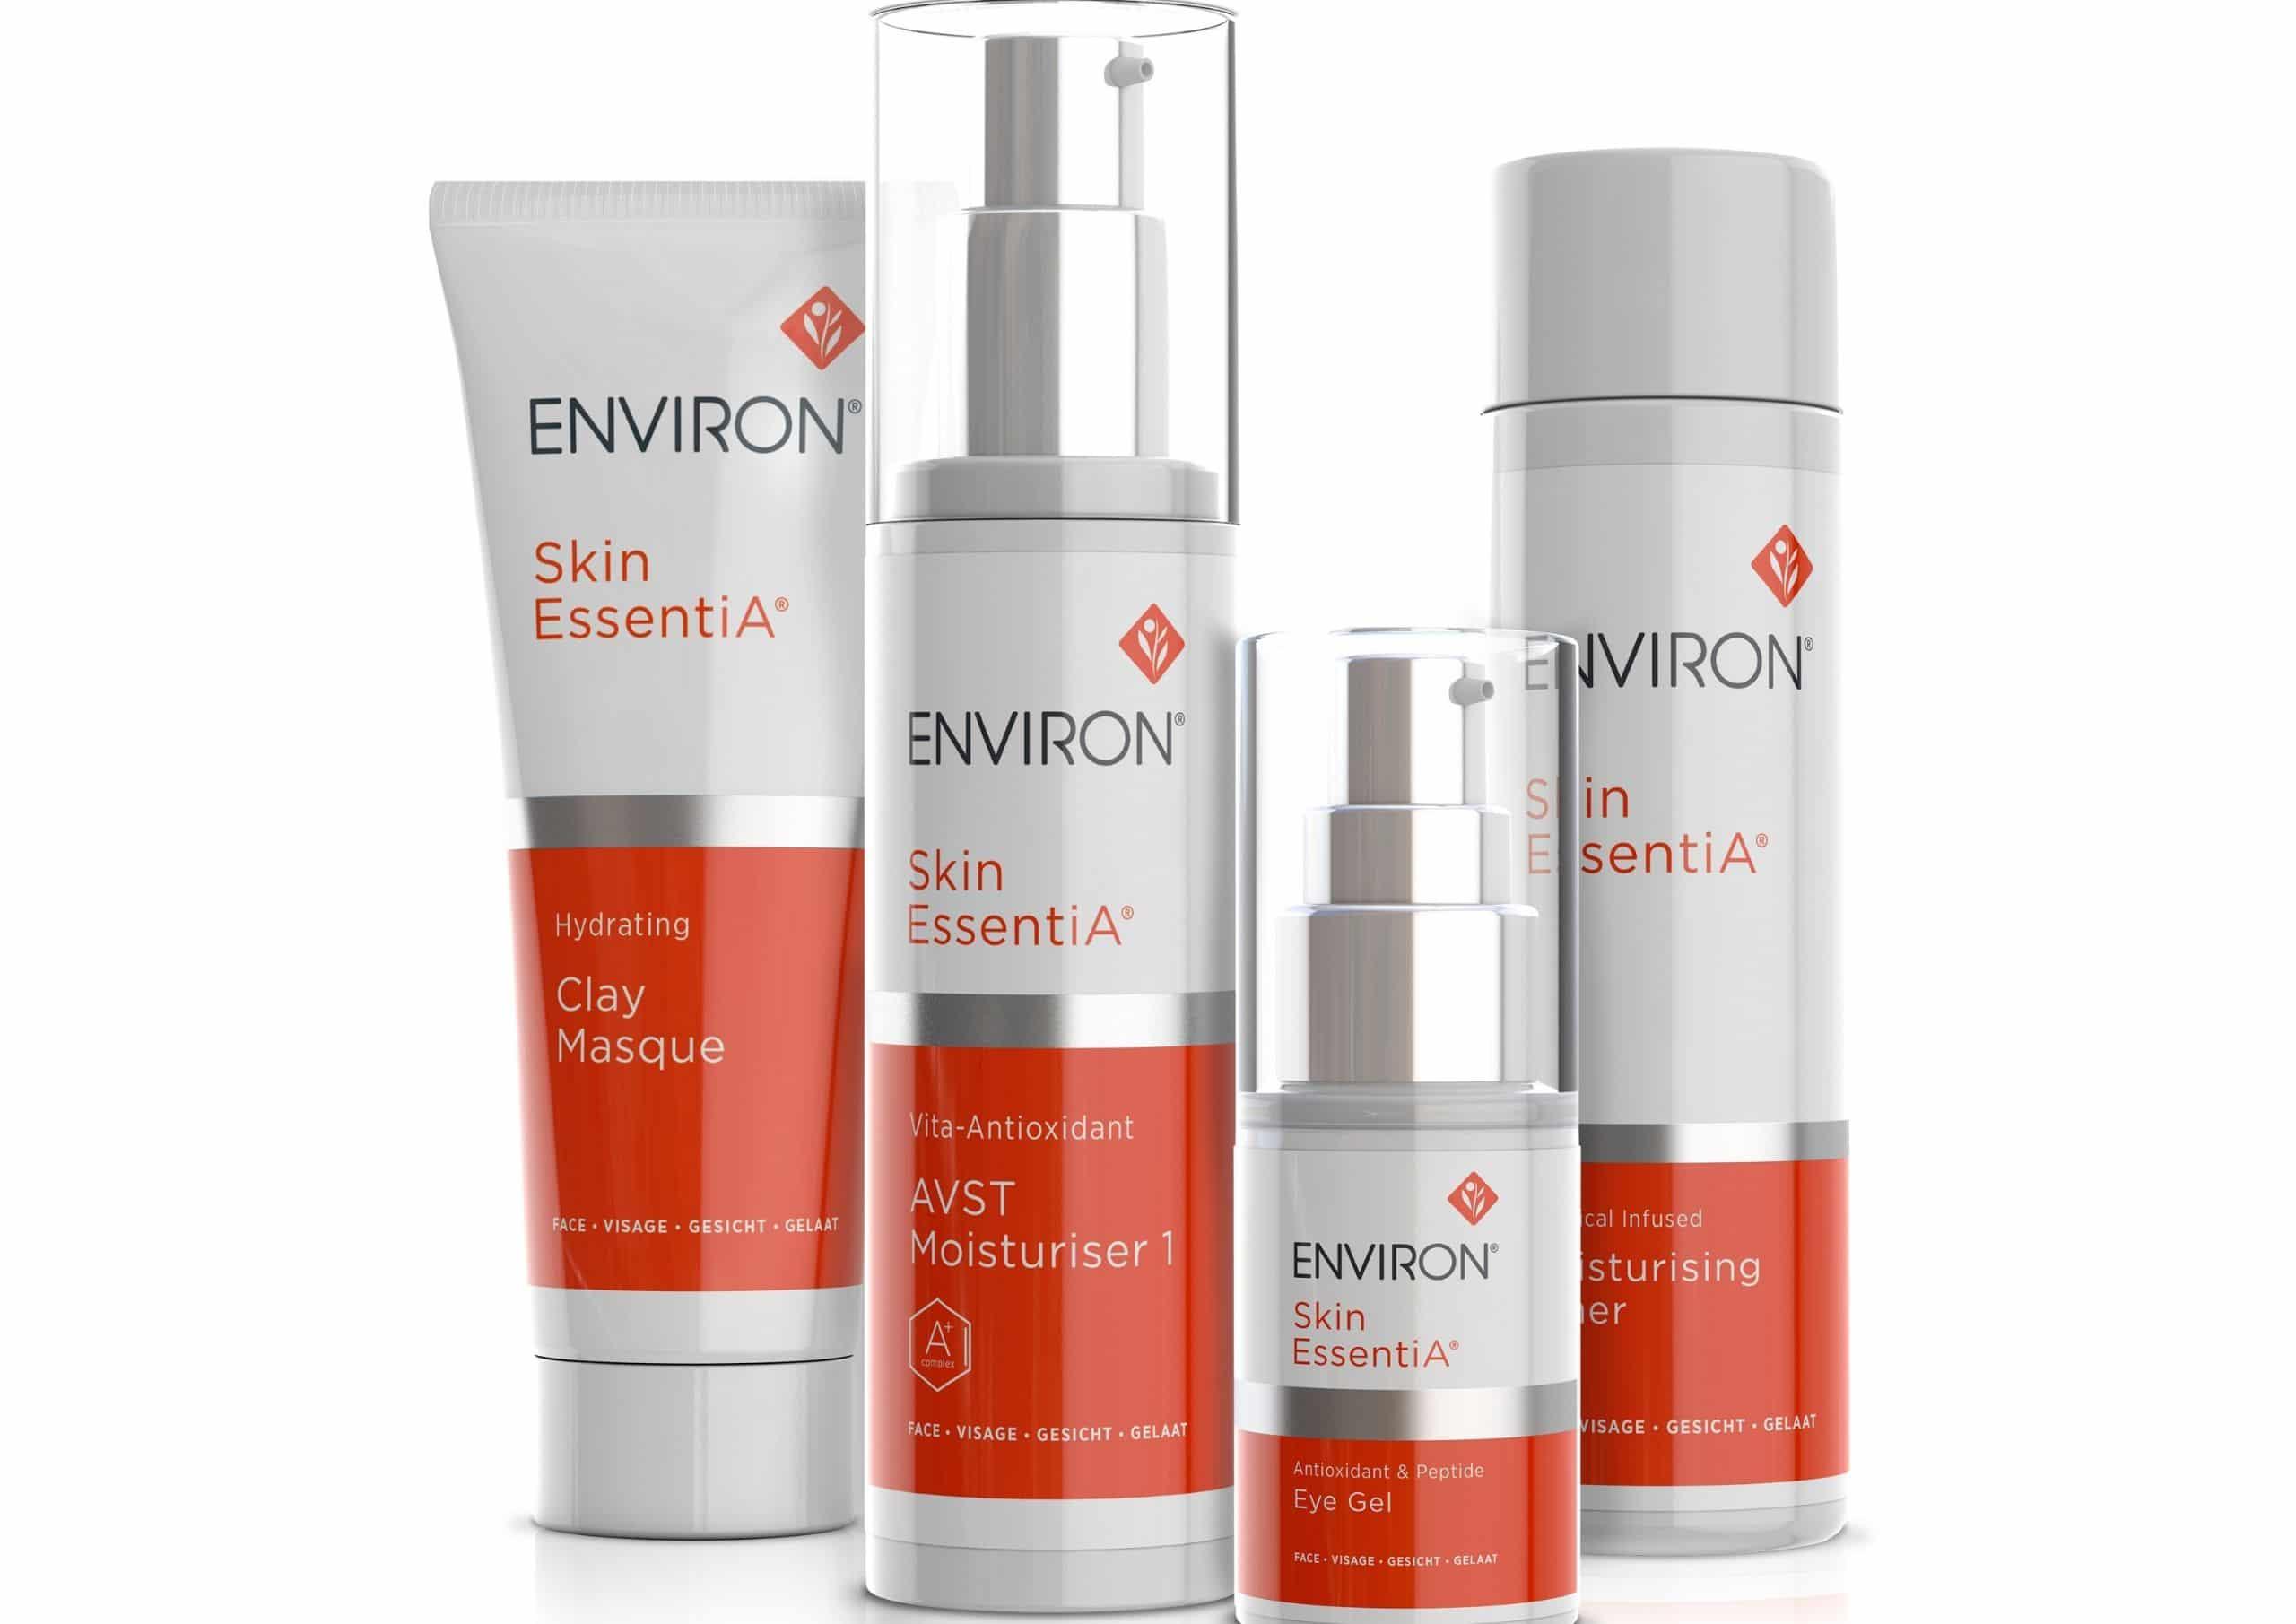 Where to buy Environ Skin Care